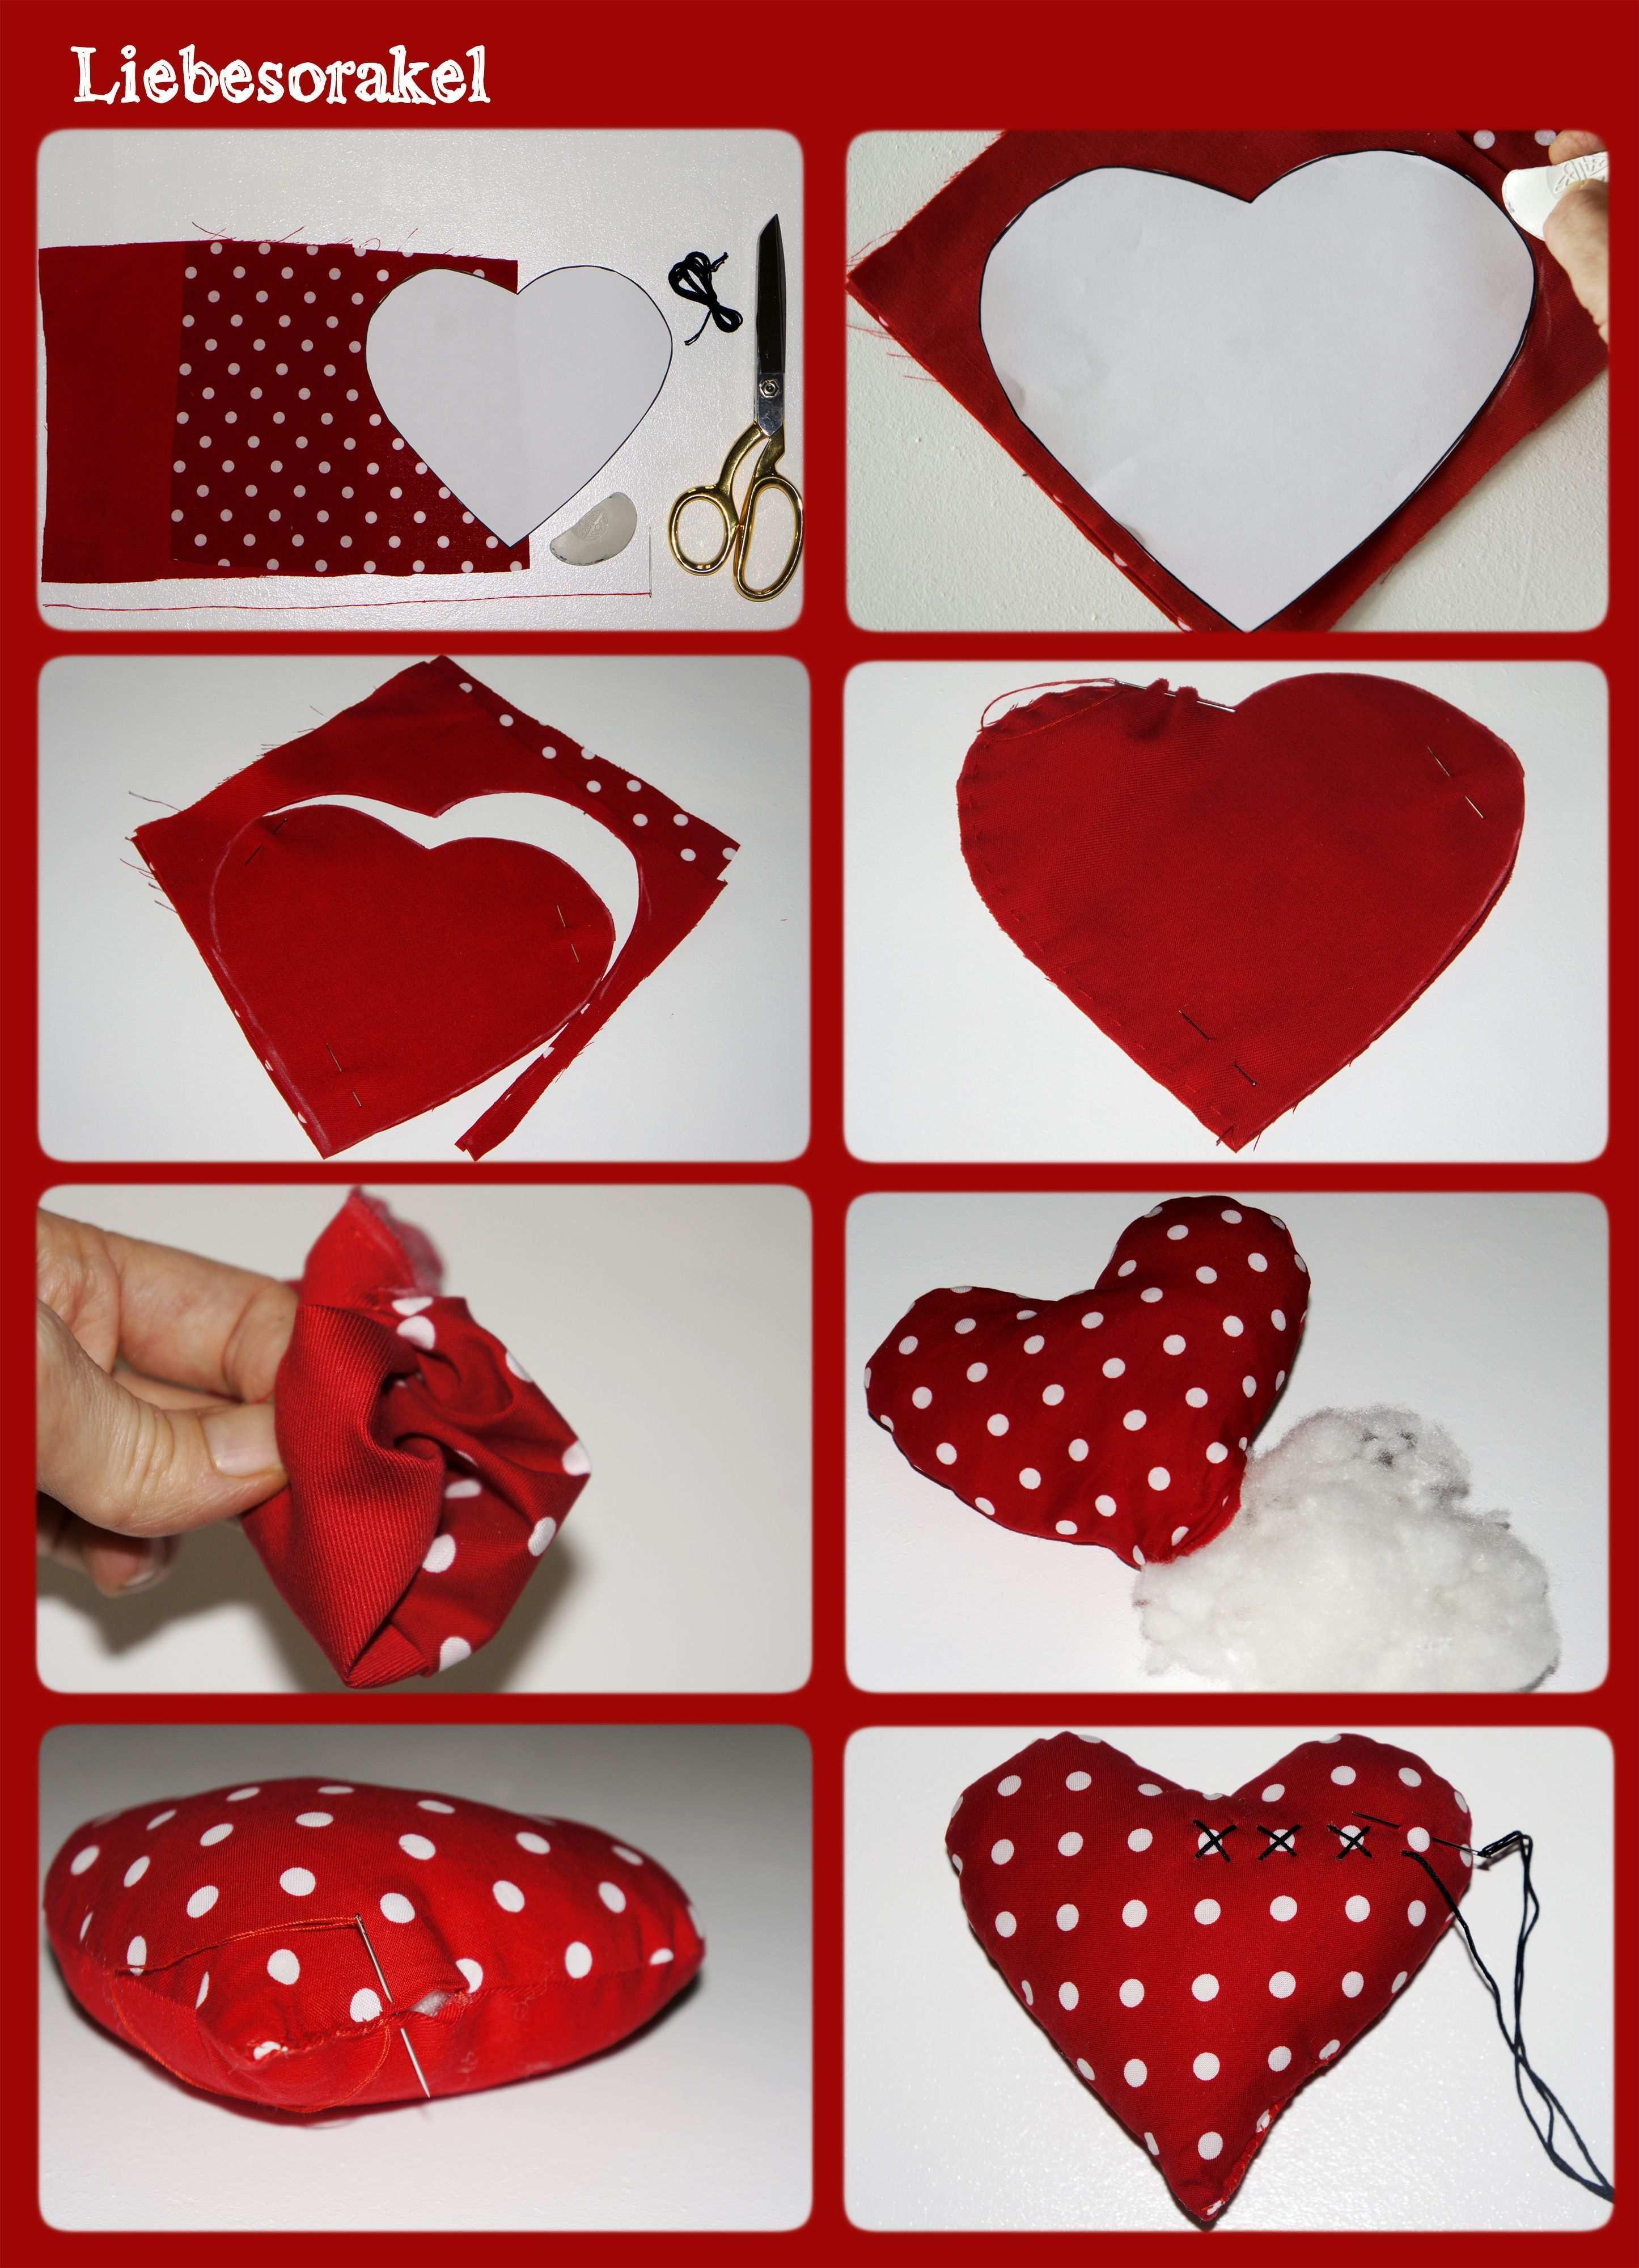 Valentinstag Liebesorakel Handmade Kultur Kreativ Valentinstag Liebesorakel